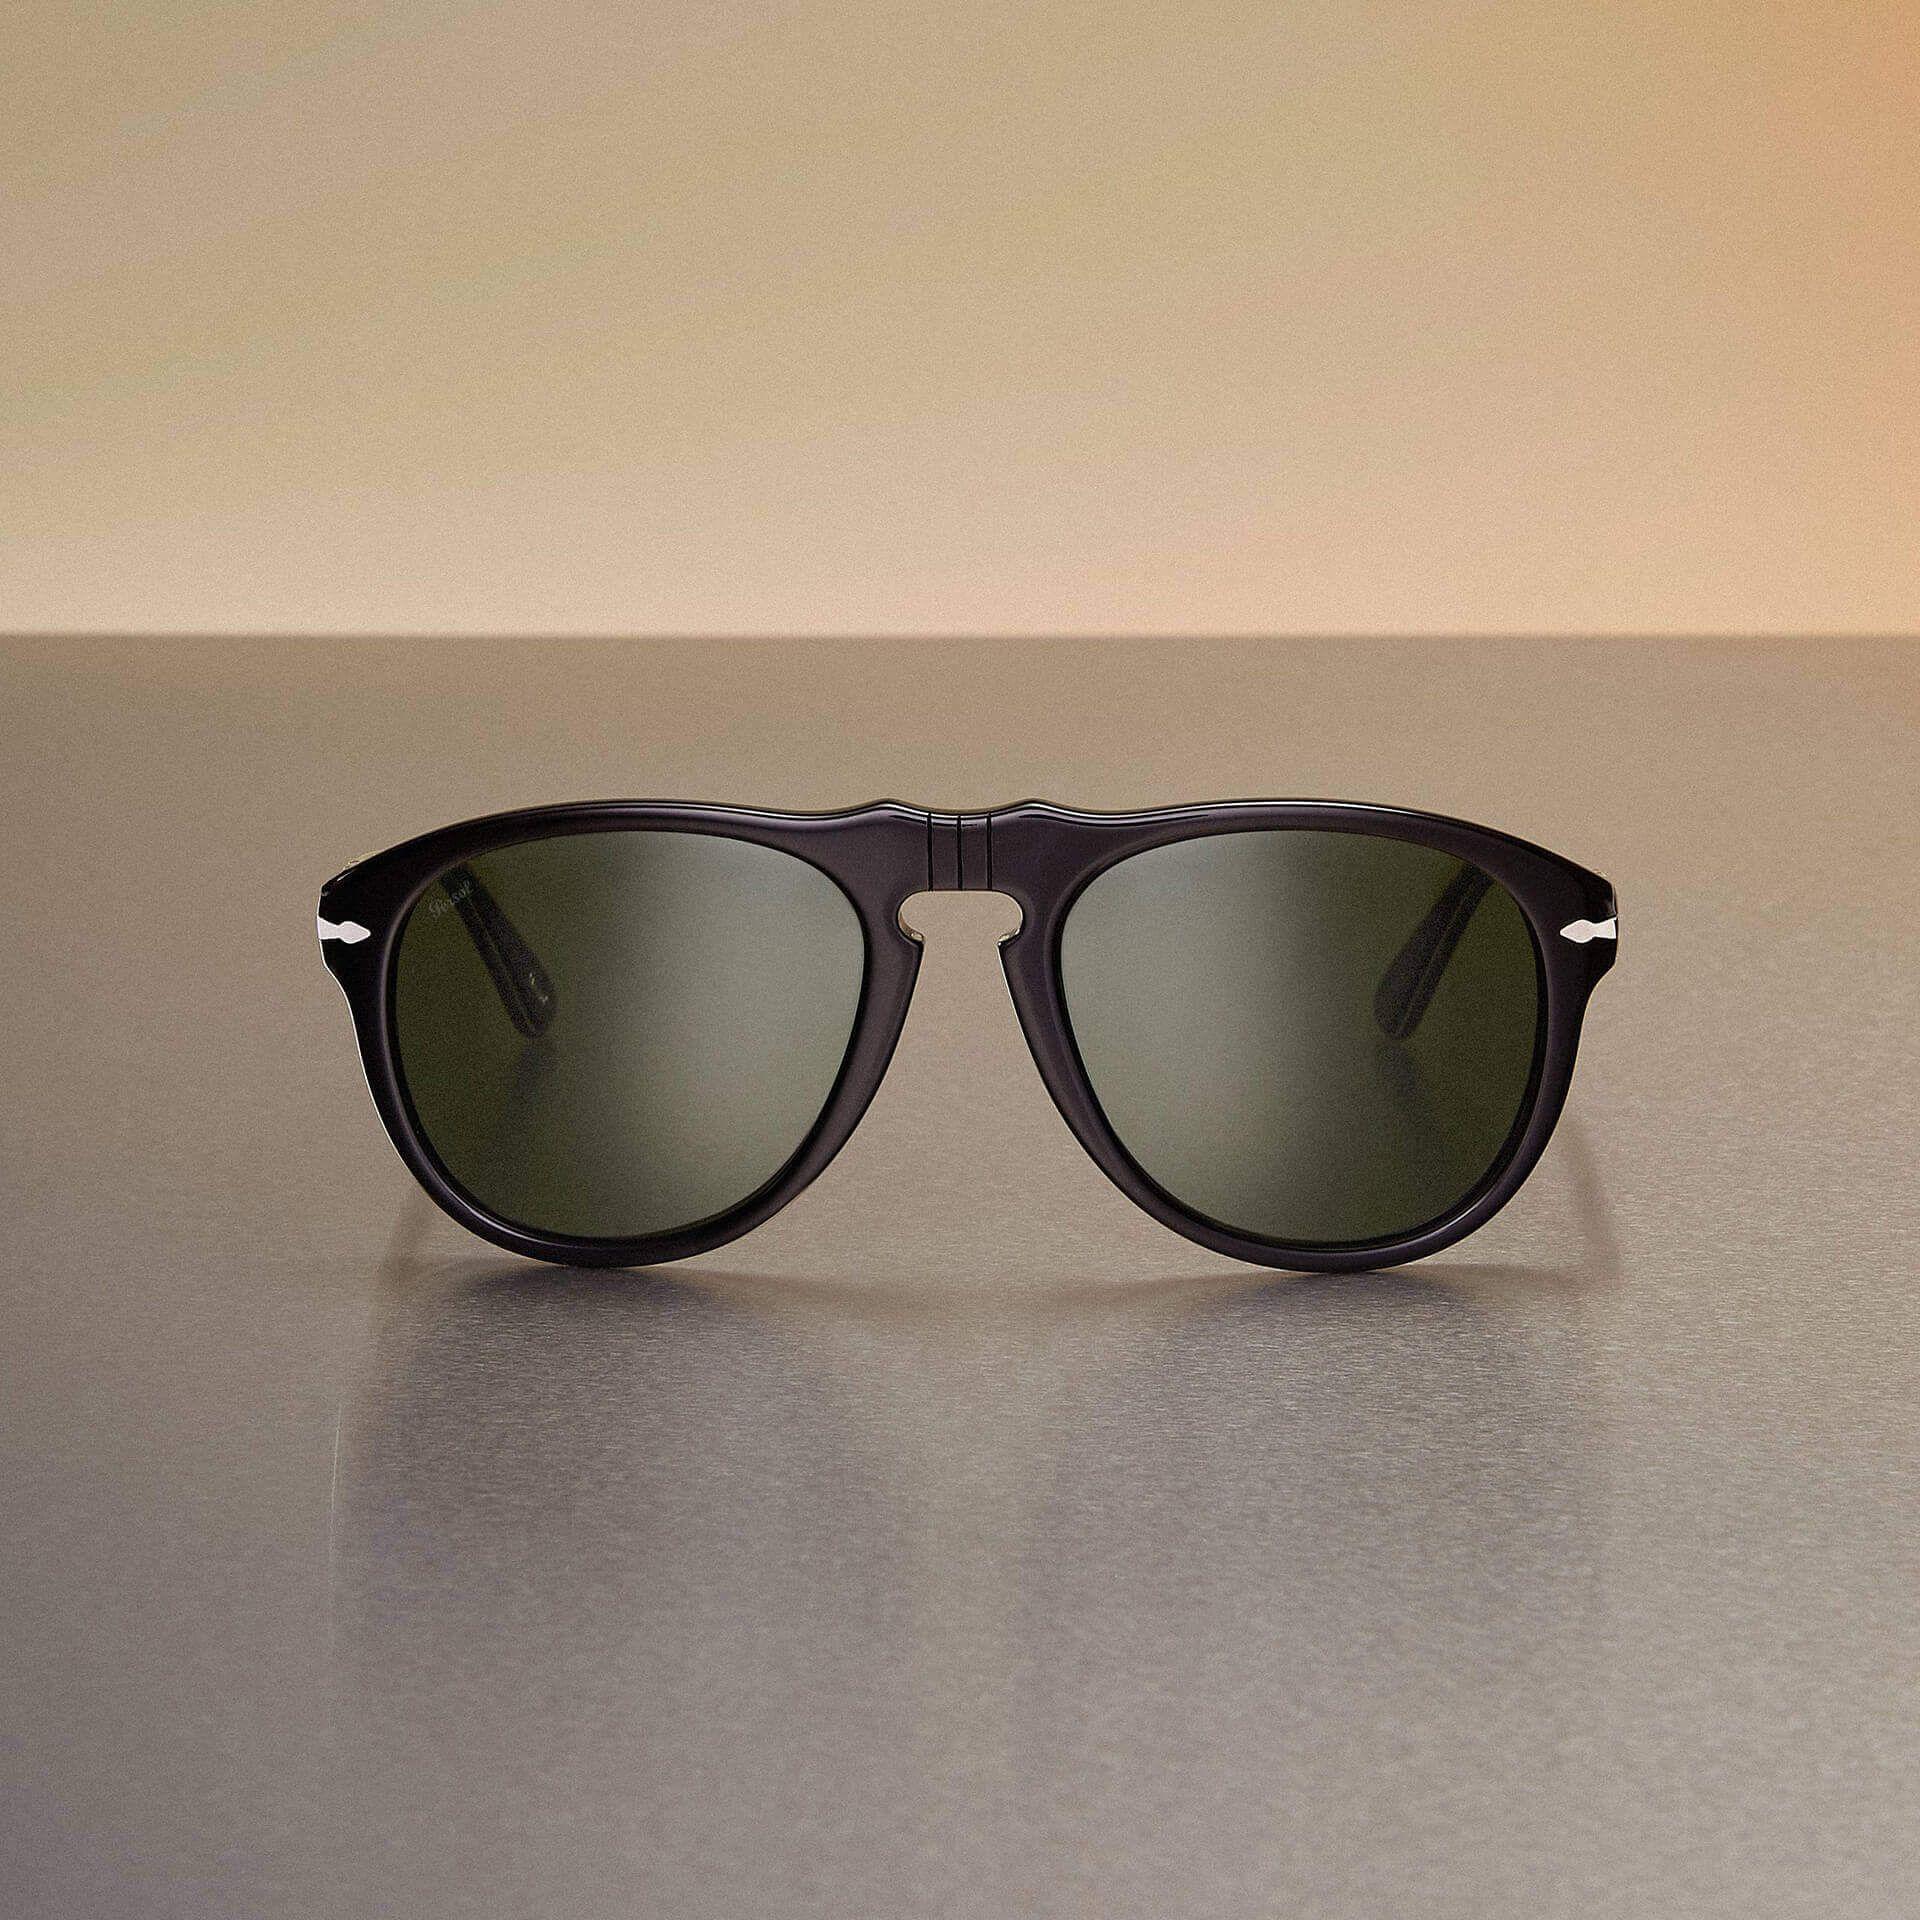 Promo sunglasses image